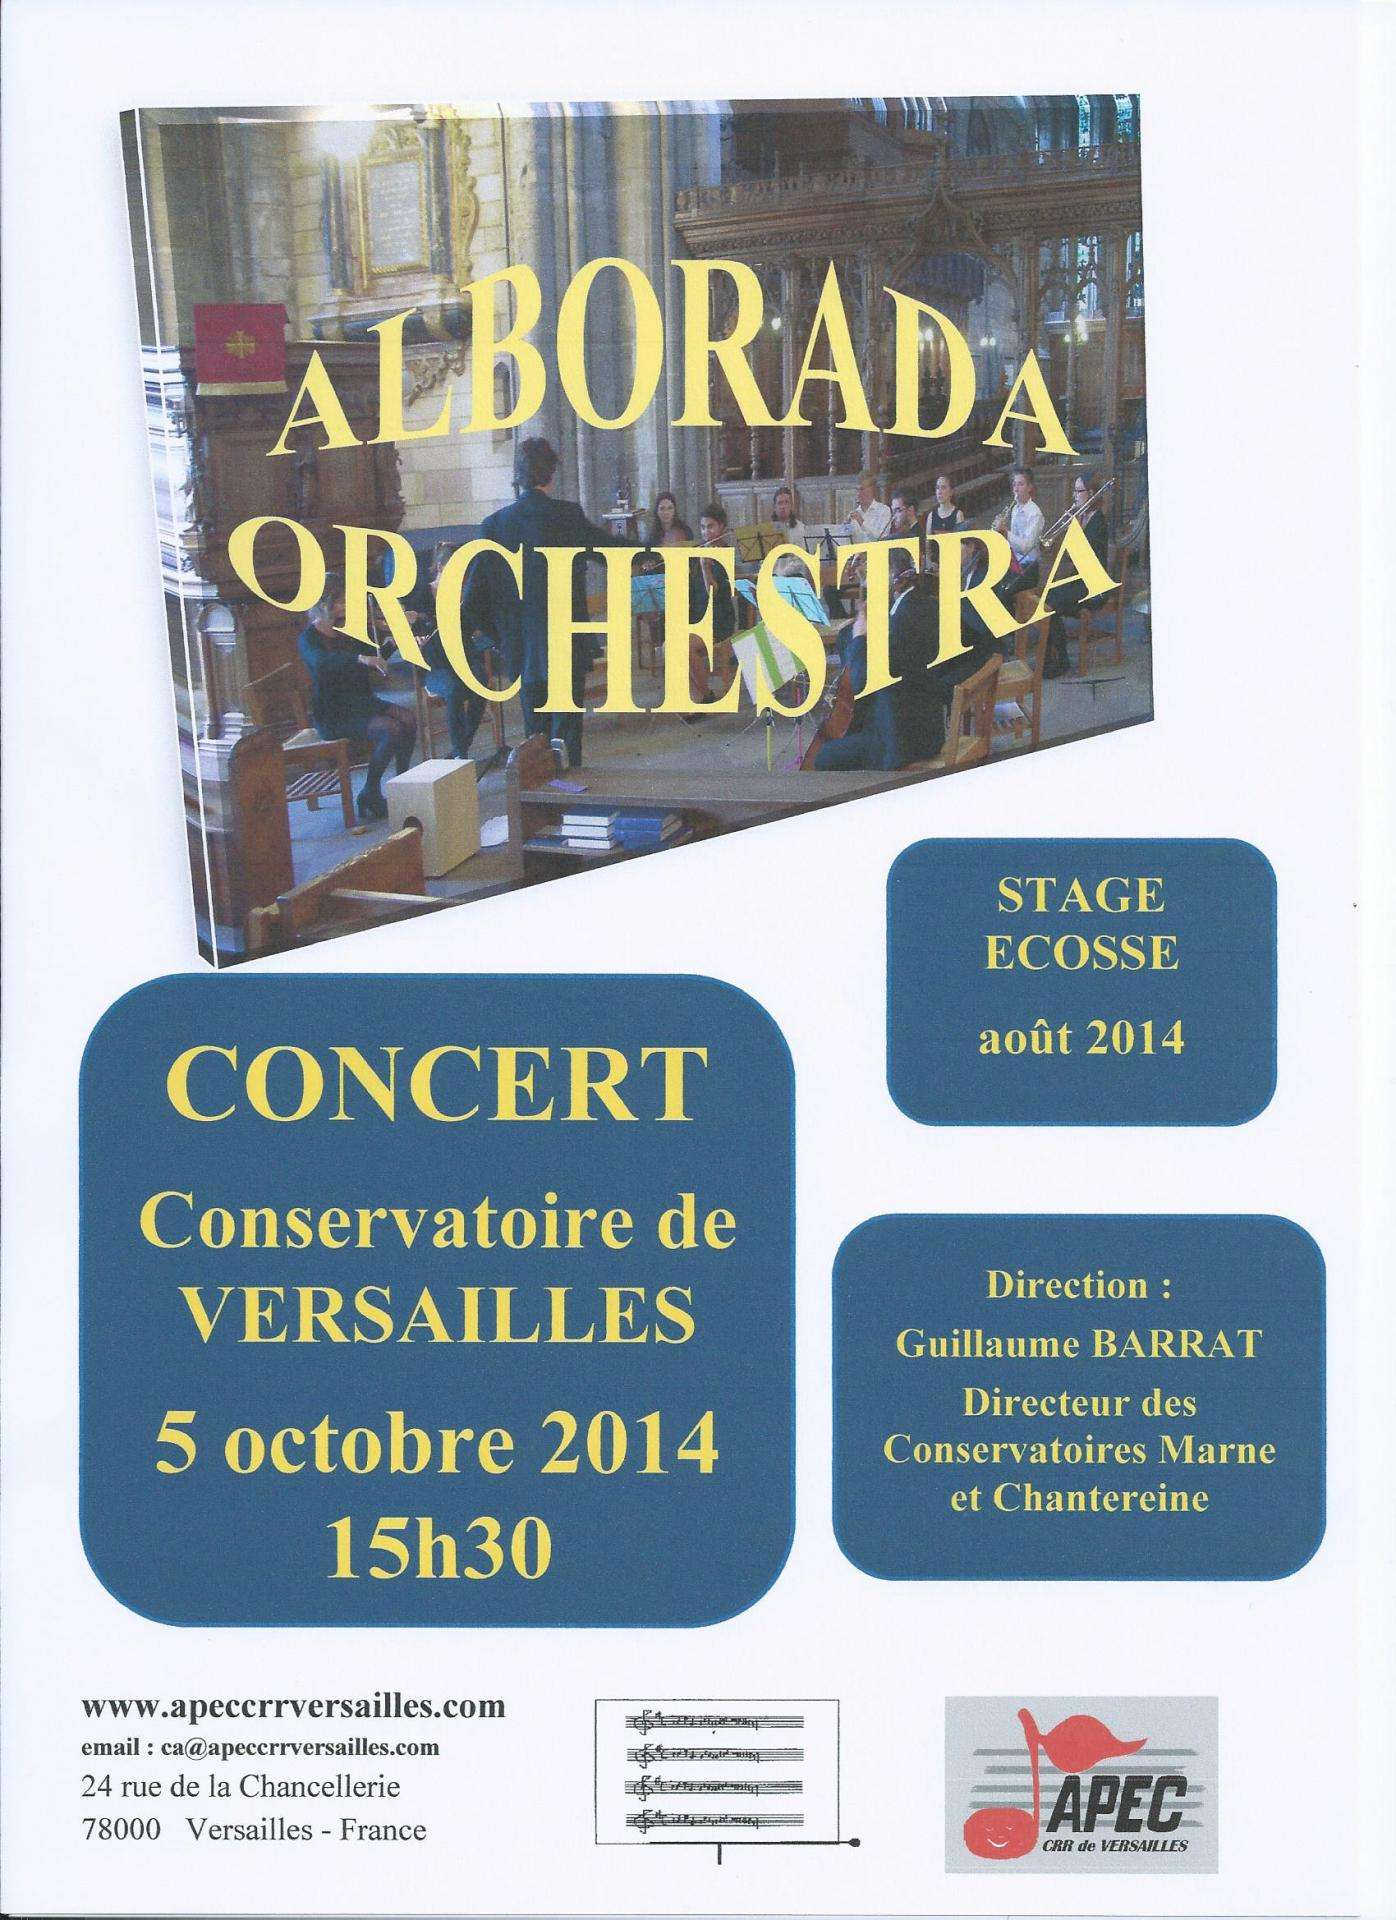 Concert Alborada Ecosse 5 octobre